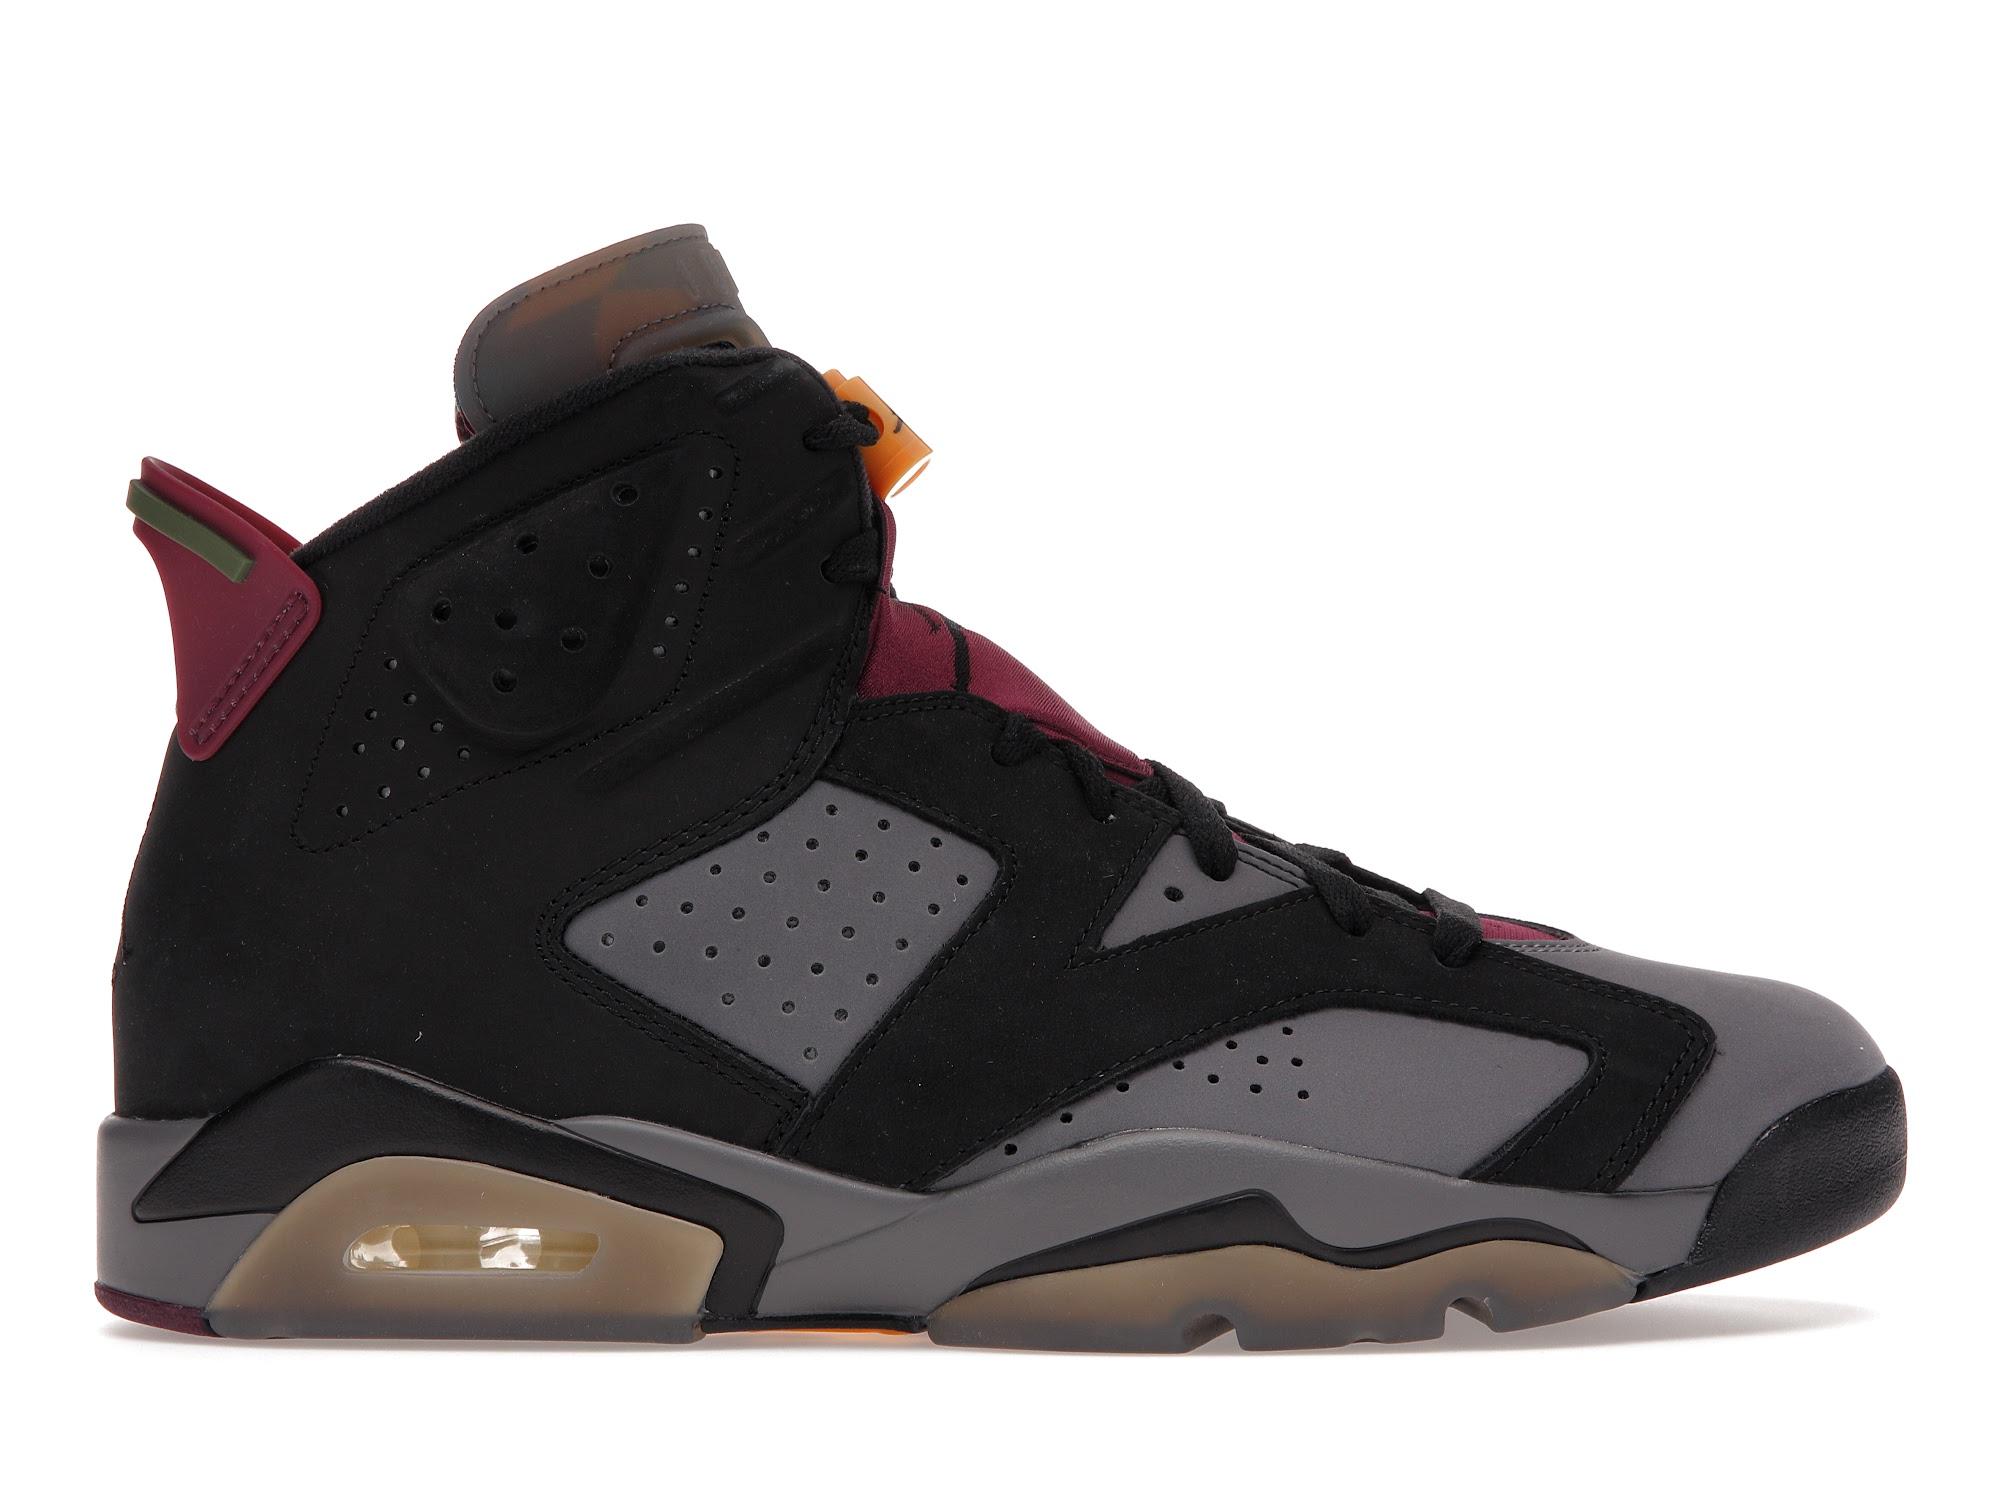 Jordan 6 Retro Bordeaux